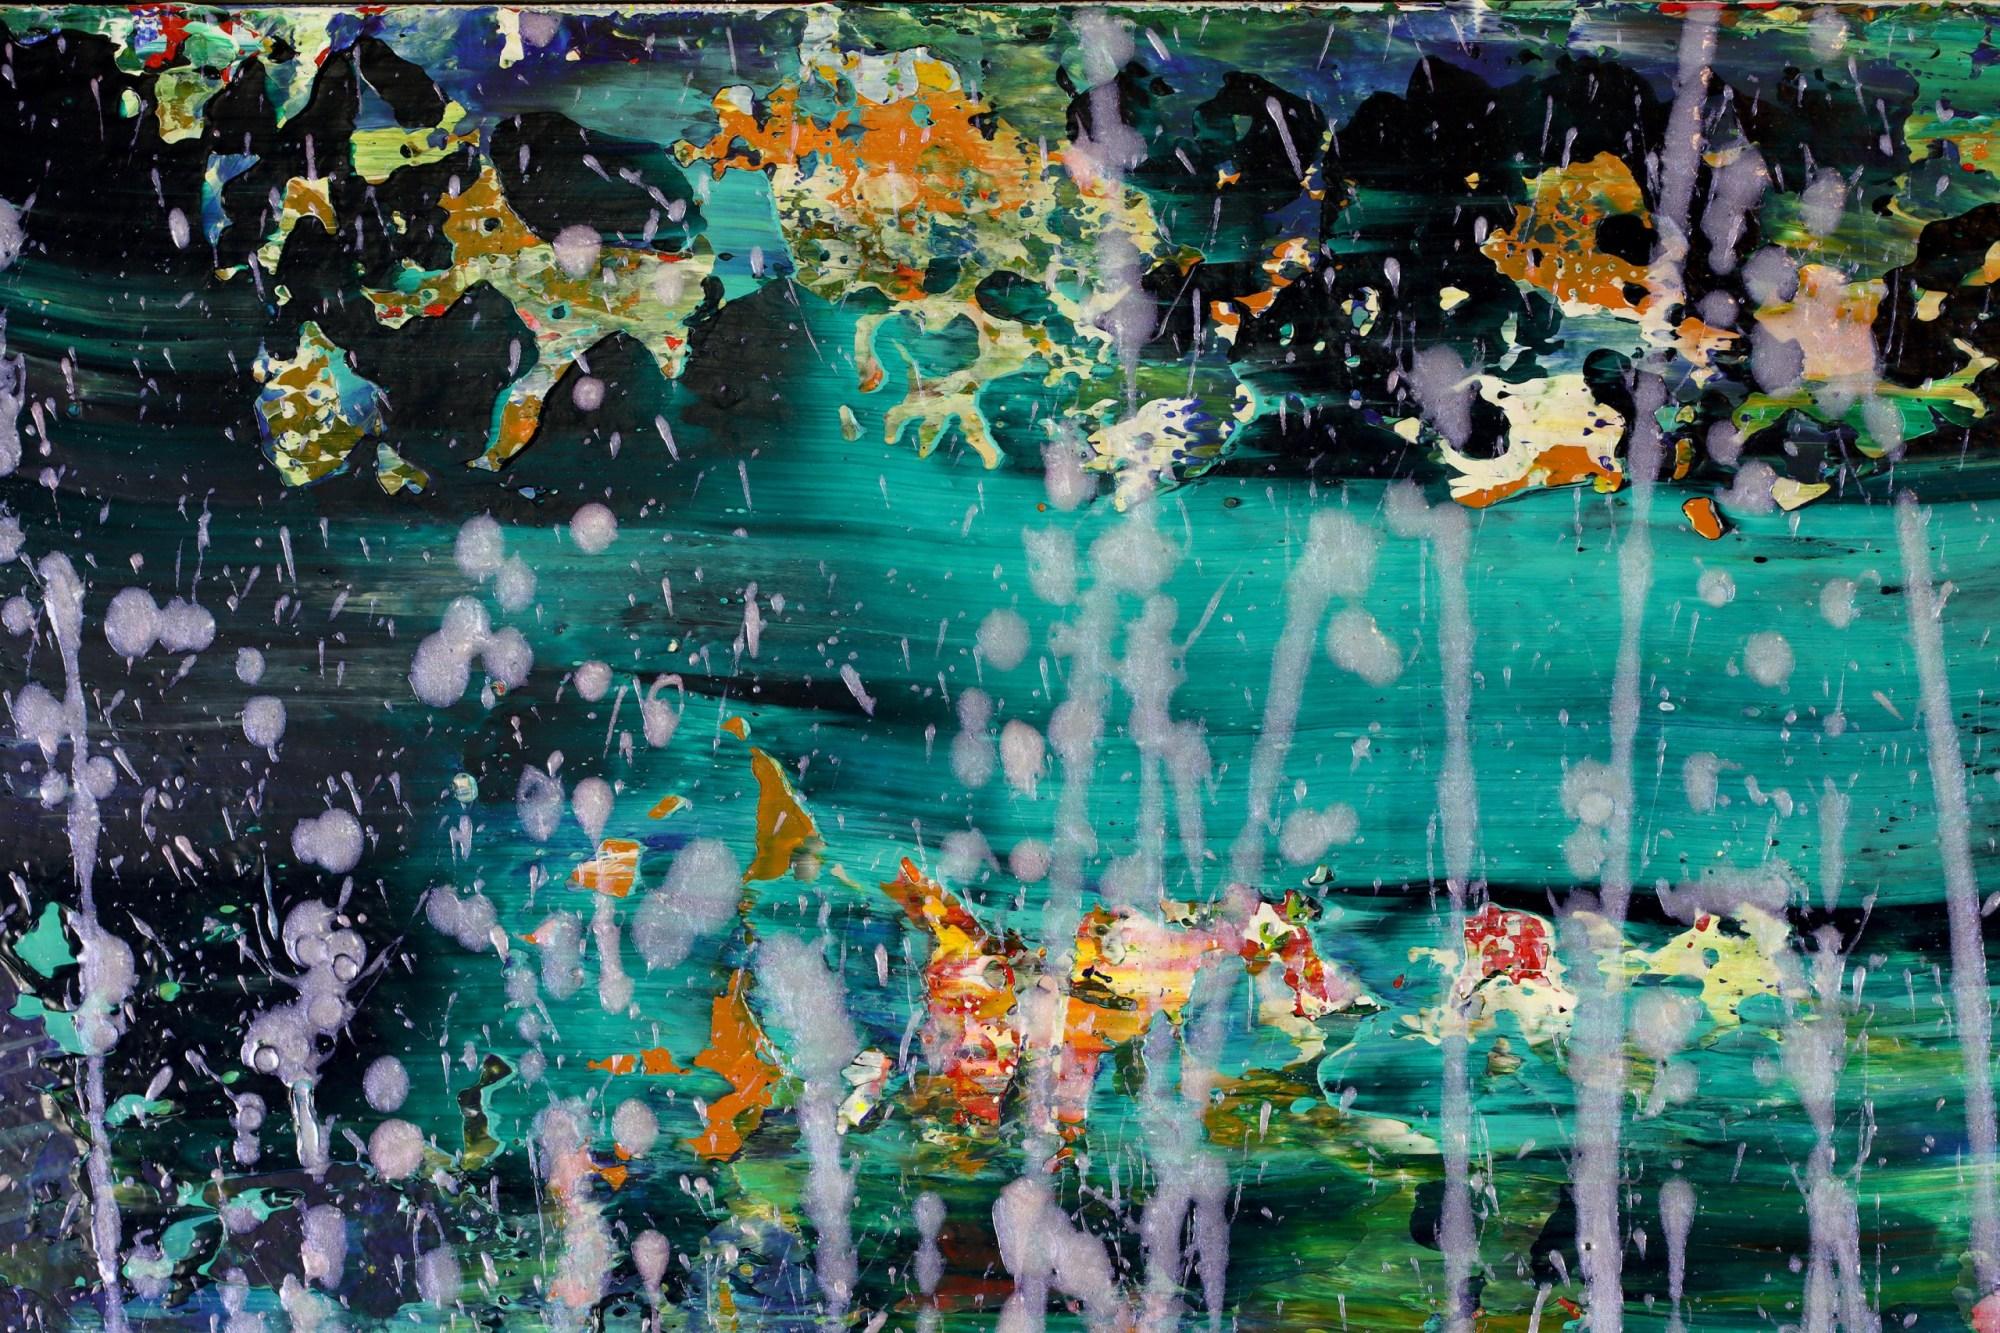 DETAIL / High Frequency Garden 2 (2021) / Artist: Nestor Toro